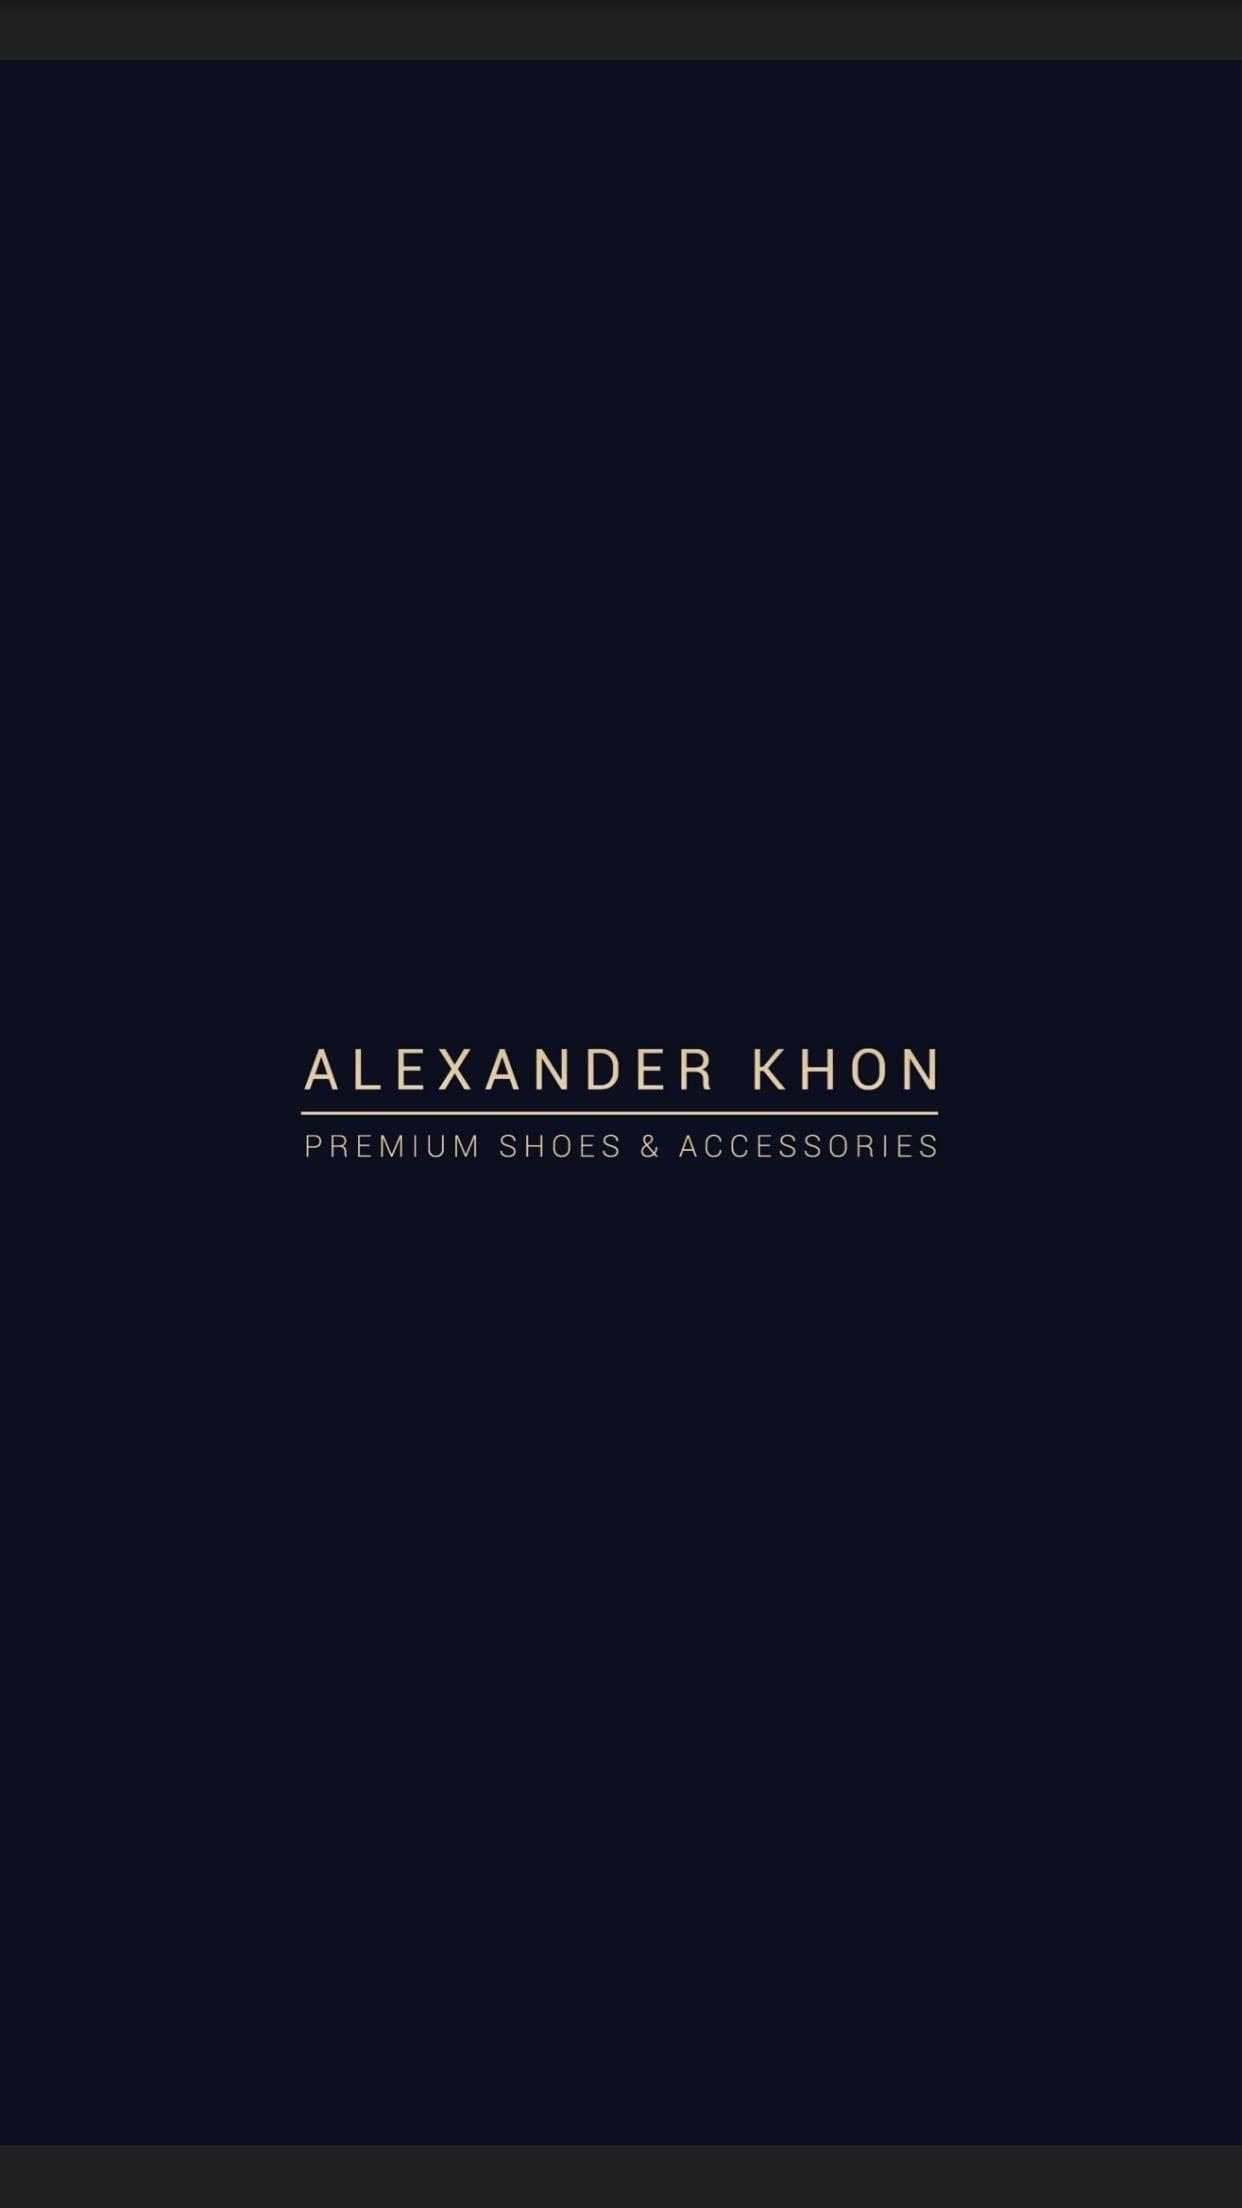 Alexander Khon